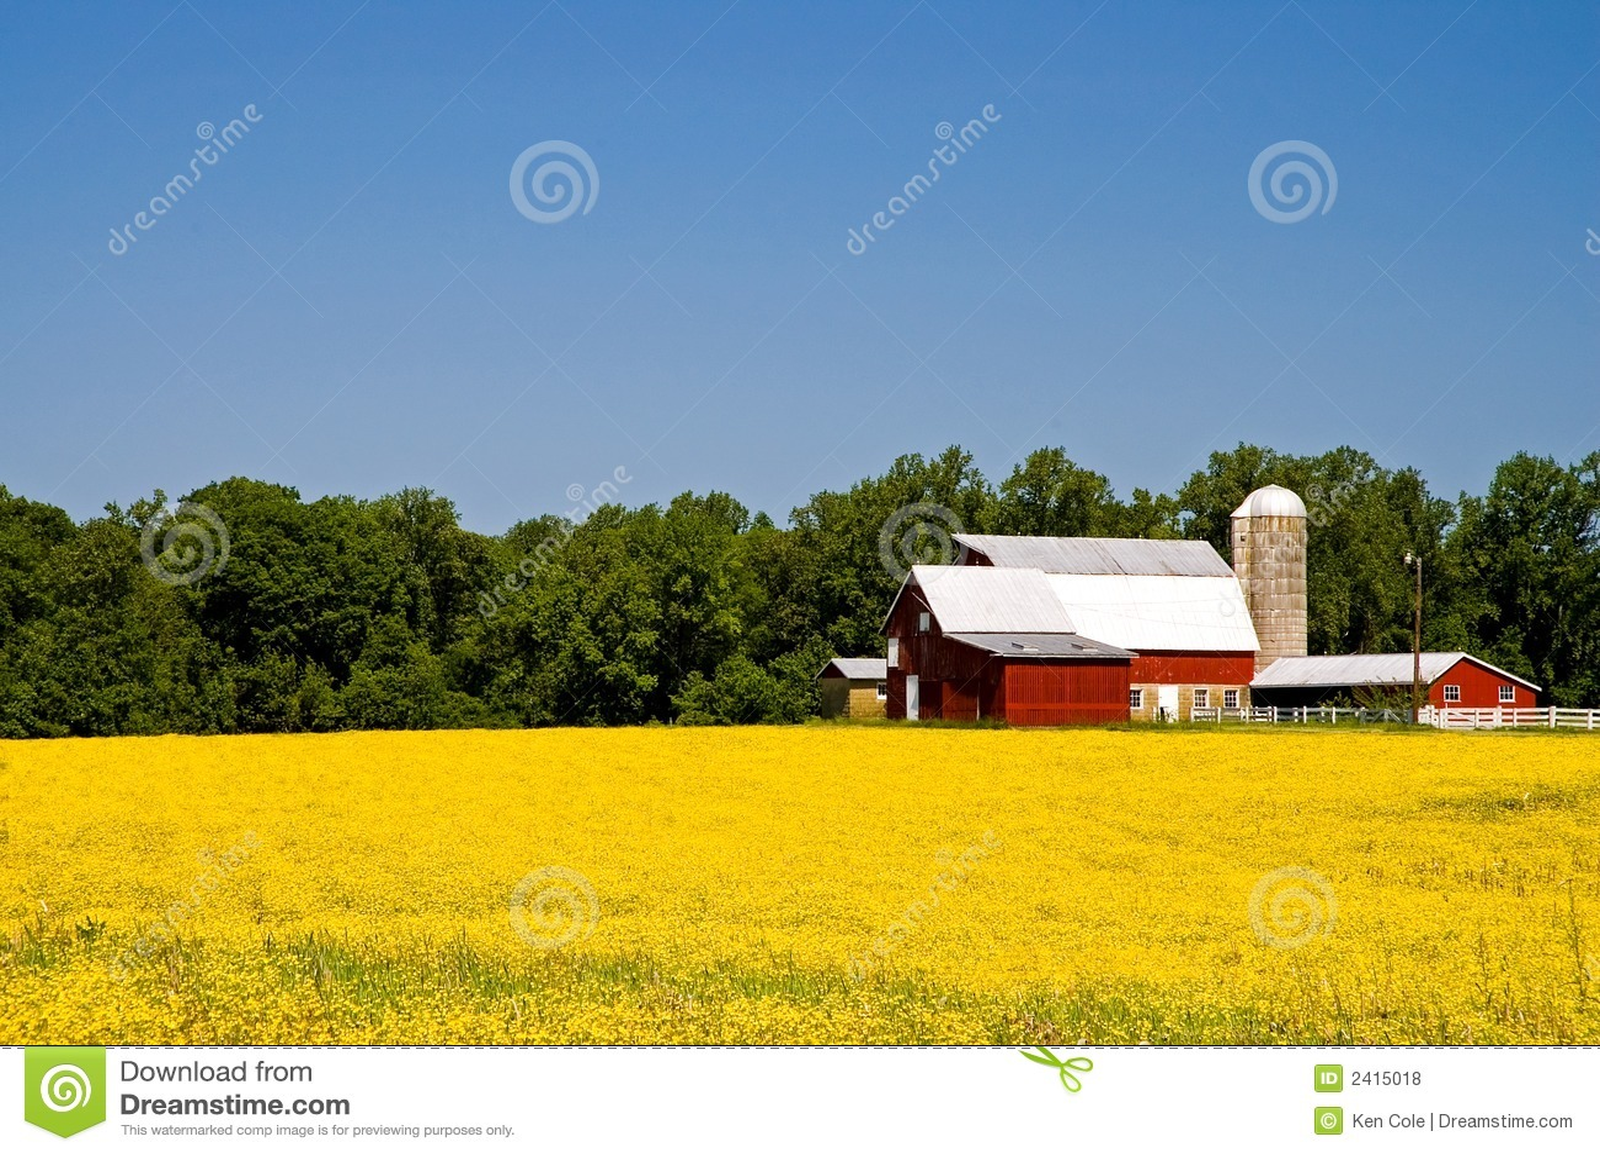 Country Farm In Springtime Royalty Free Stock Photos ...